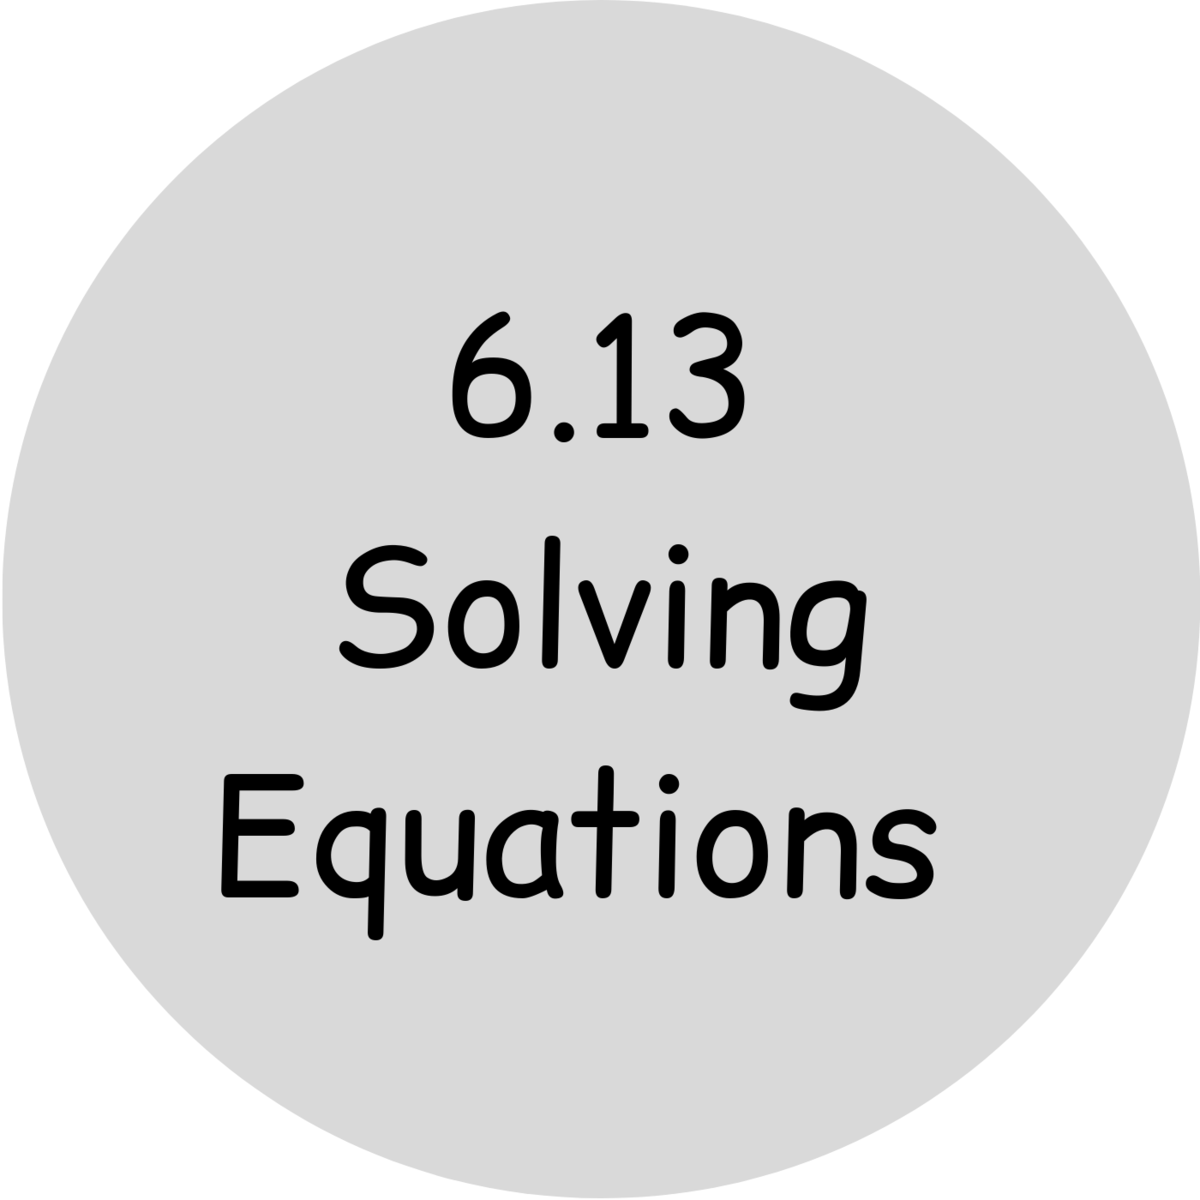 6.13 solving equations